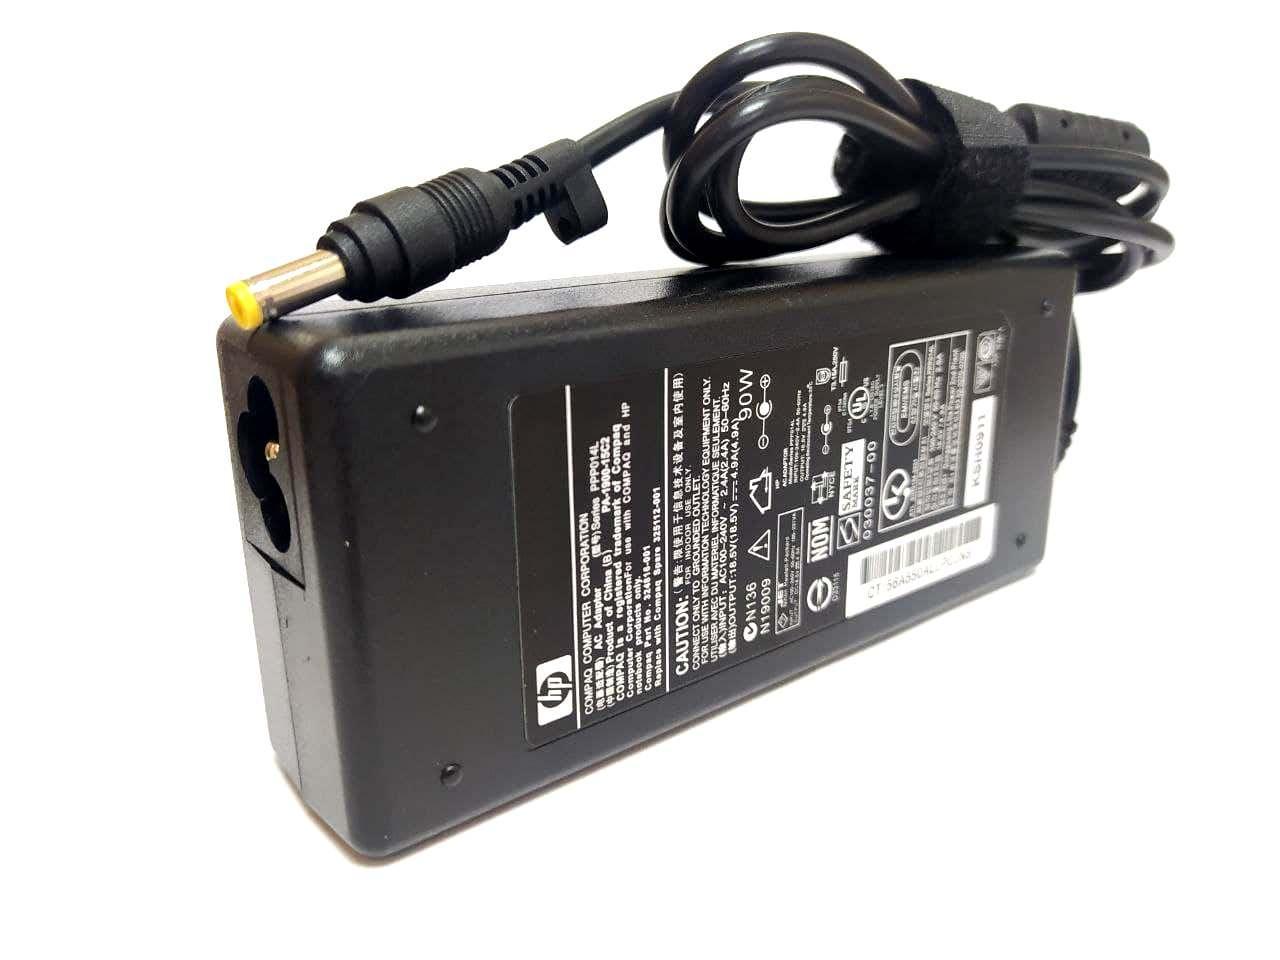 Блок питания для ноутбука HP Pavilion DV1010 18.5V 4.9A 4.8*1.7mm 90W